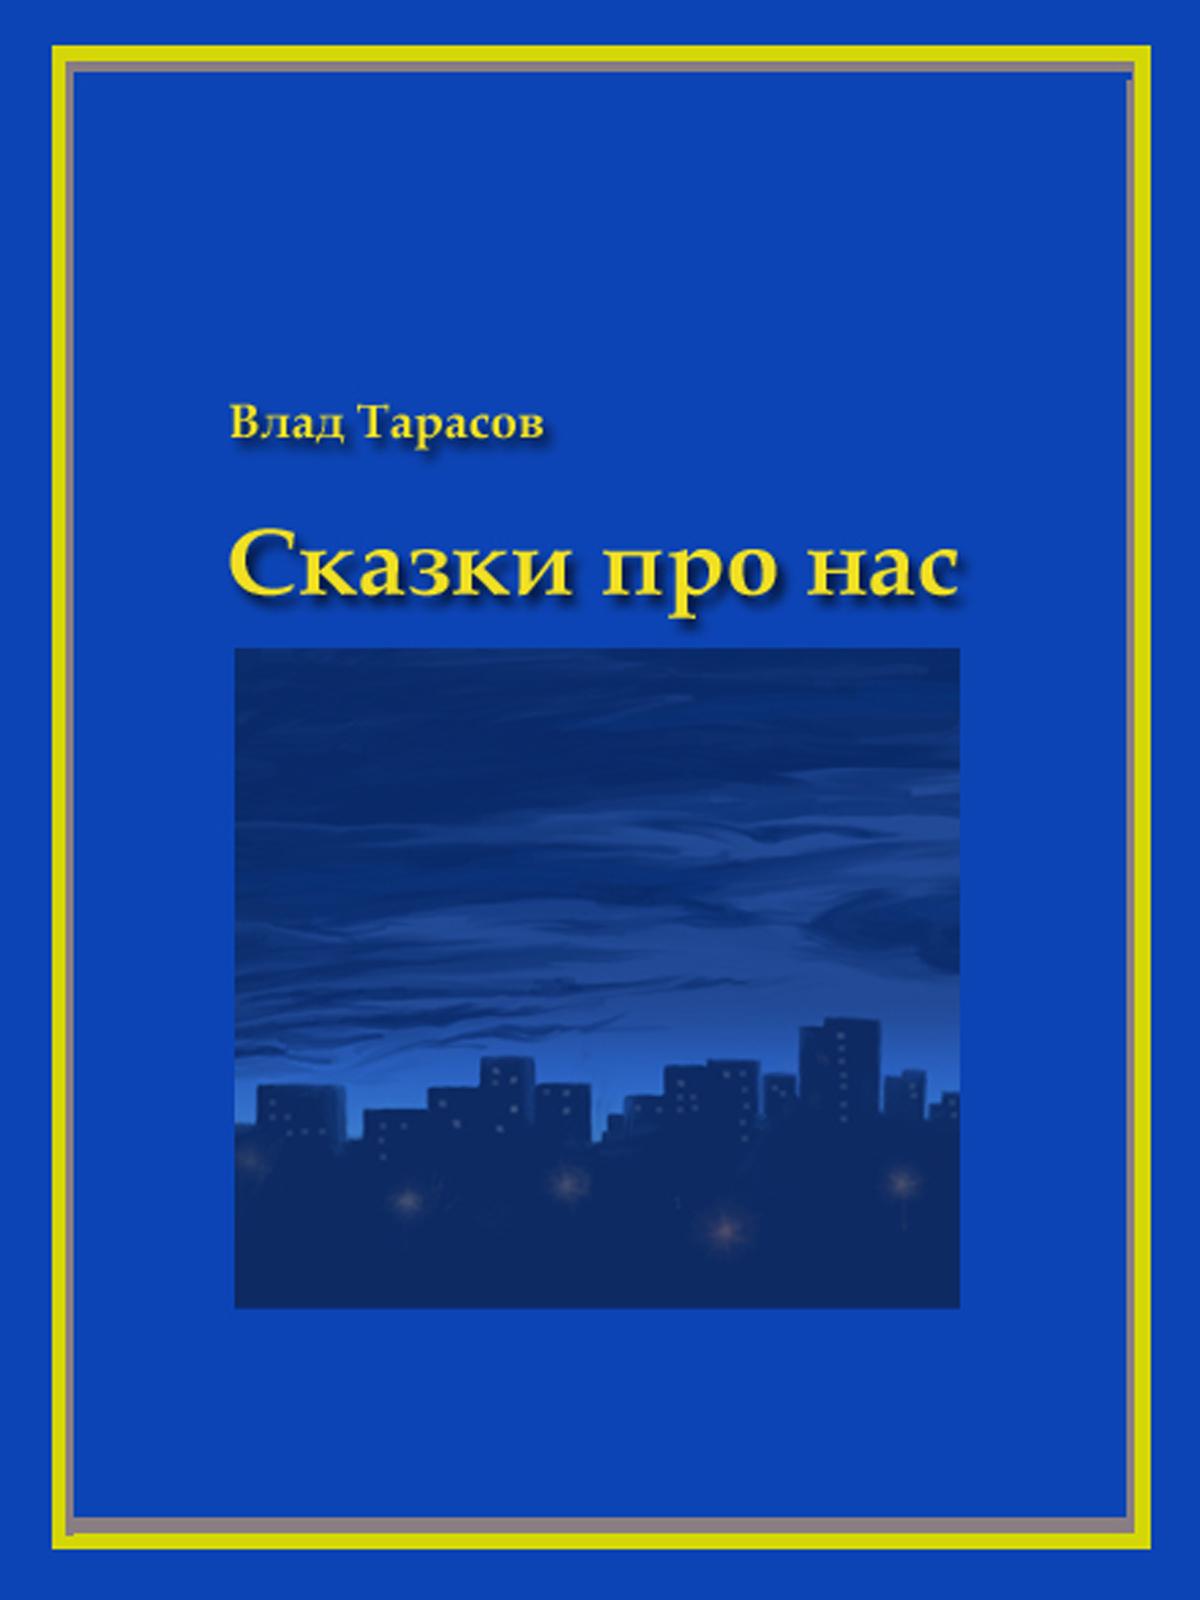 Владислав Тарасов «Сказки про нас»